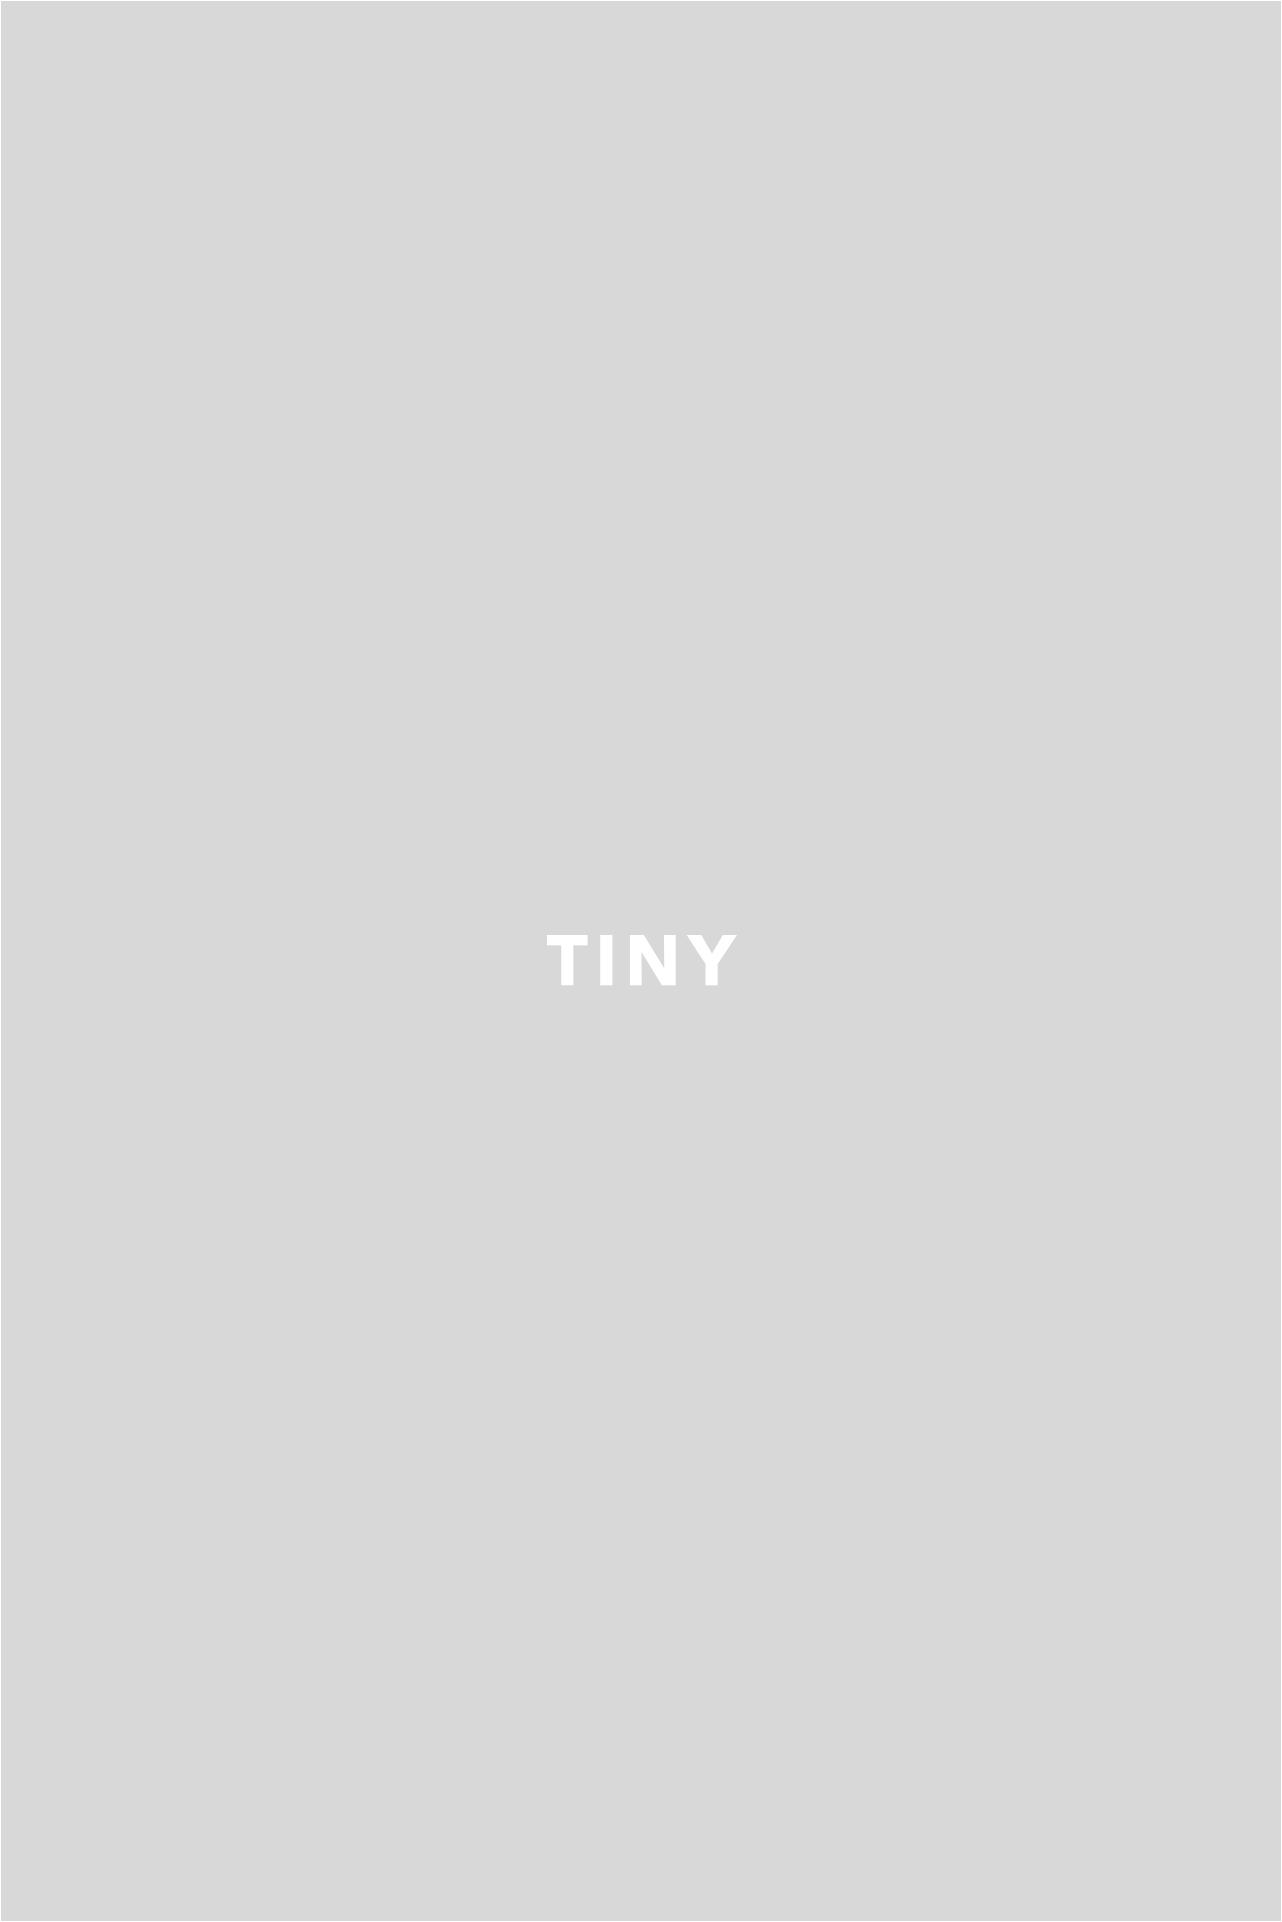 WOMAN THE TINY BIG SISTER CREWNECK SWEATSHIRT